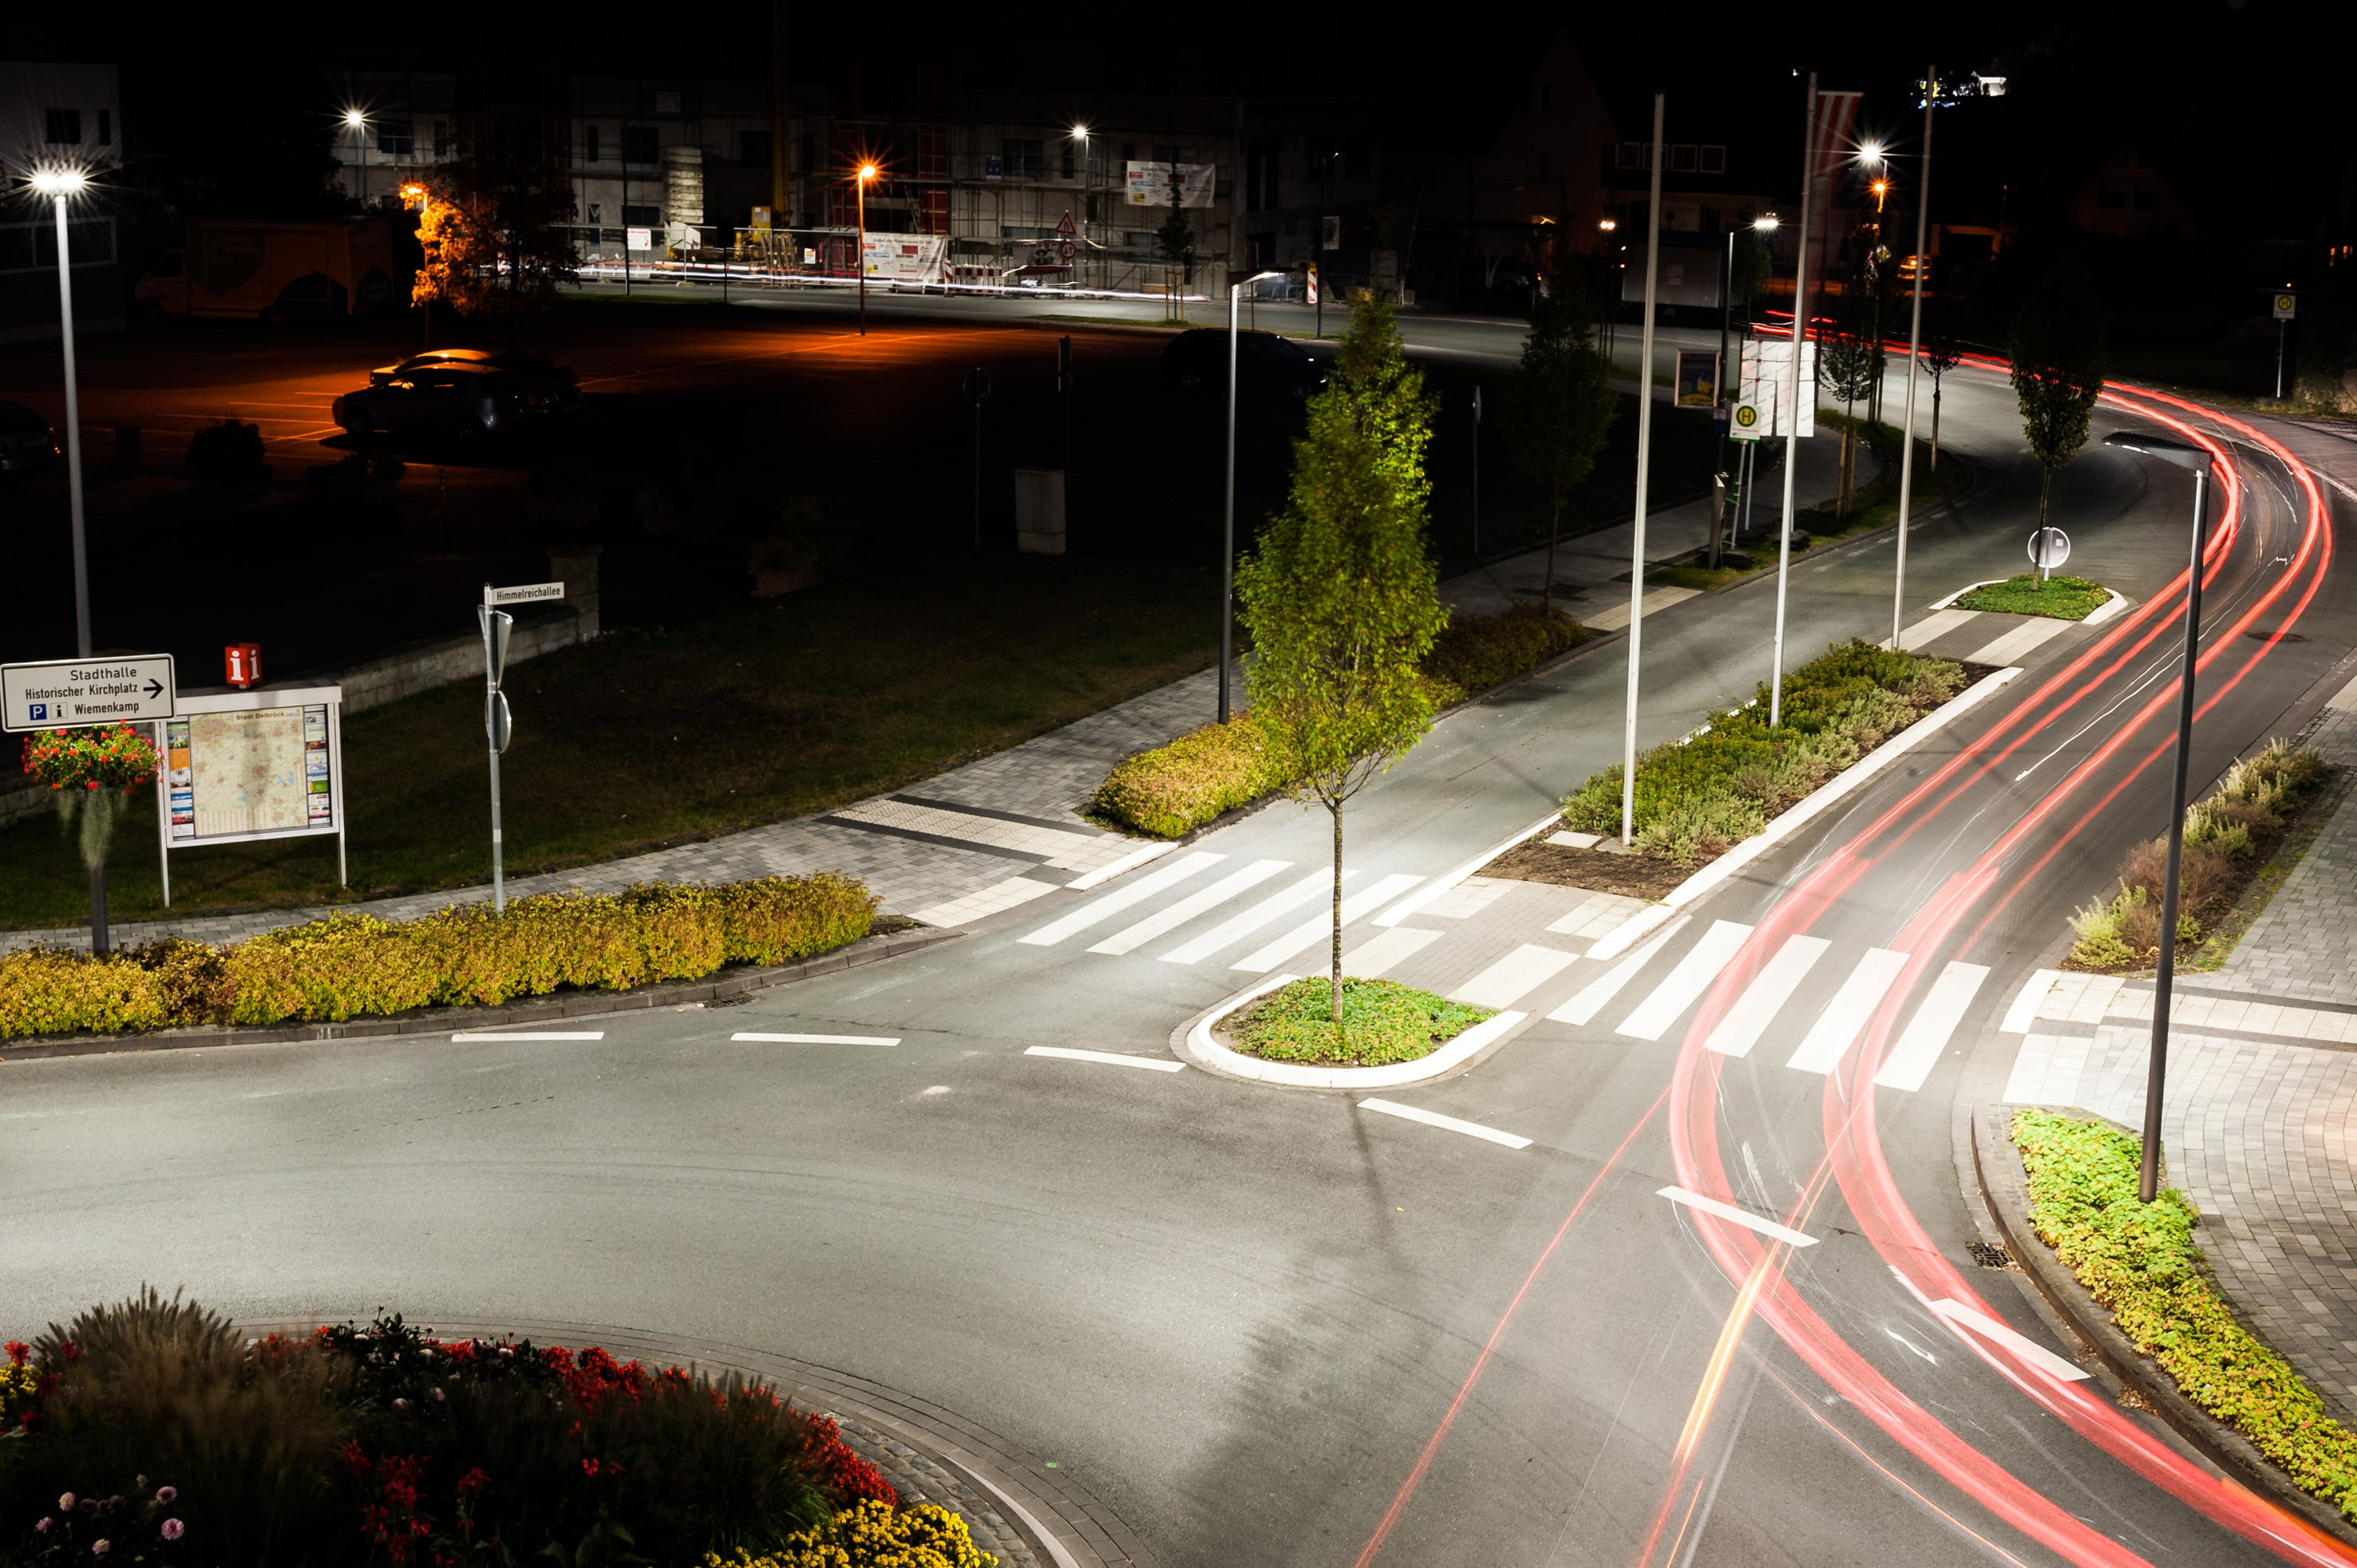 Led street lighting roadway lighting led street lamps fixtures roadway lighting led street lighting fixtures led street lighting projects street lighting arubaitofo Image collections